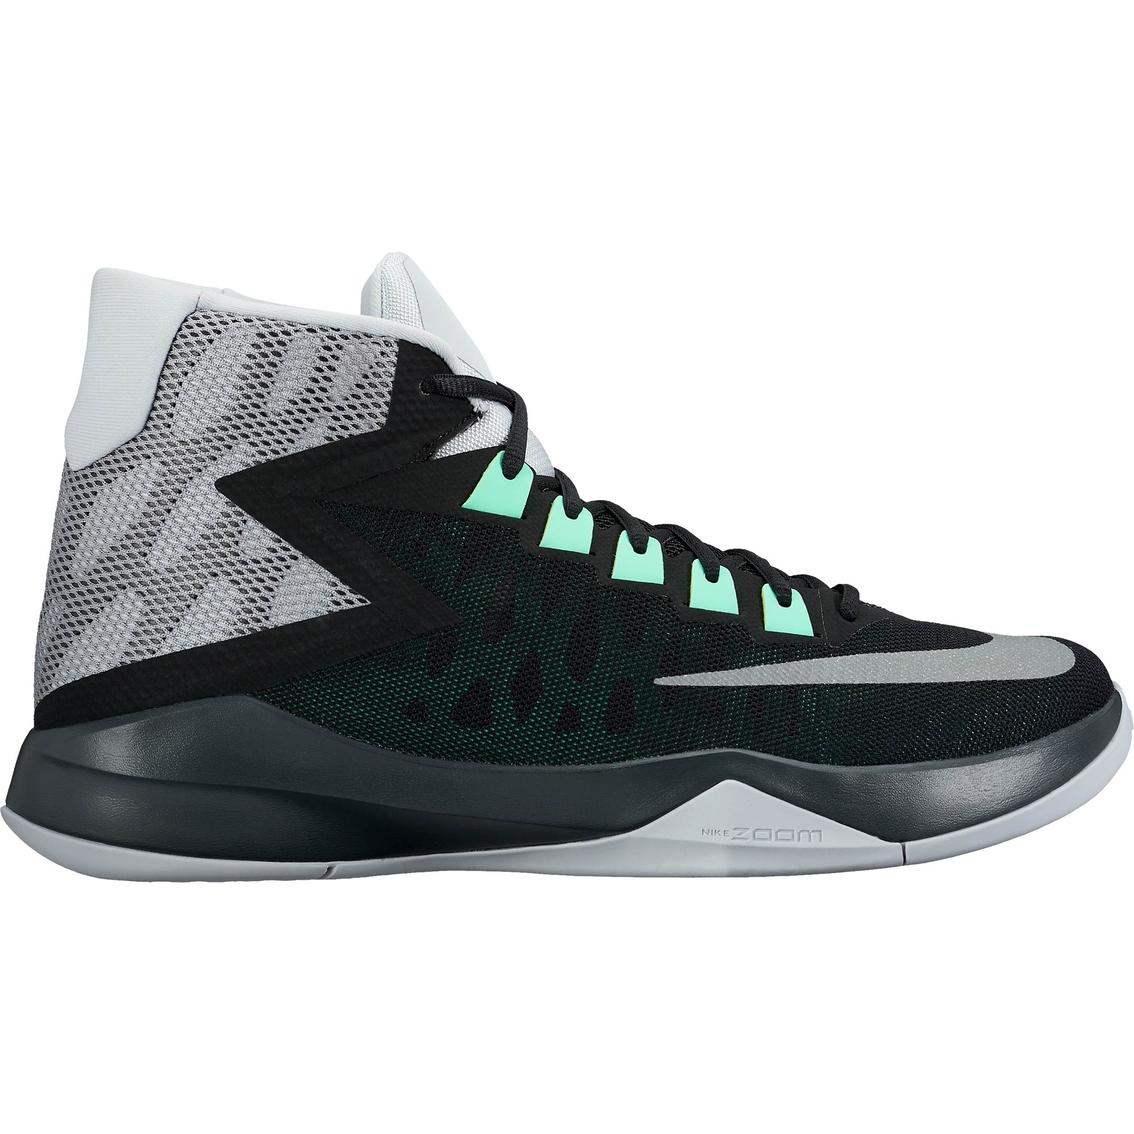 4e348562da4b Nike Men s Zoom Devosion Basketball Shoes